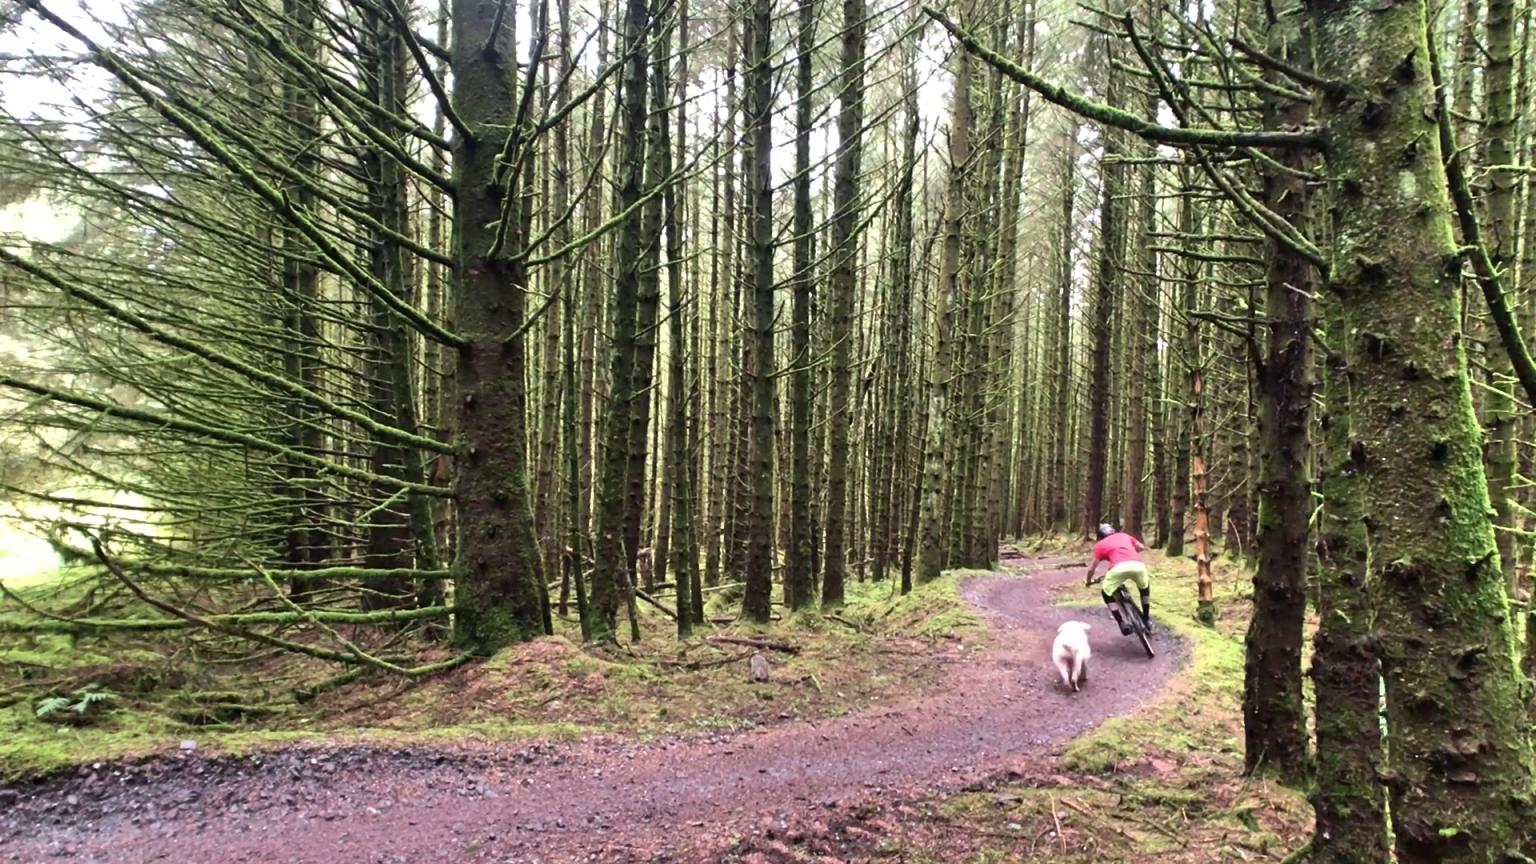 ni_explorer_davagh_forest_mountain_biking_northern_ireland (5).jpg